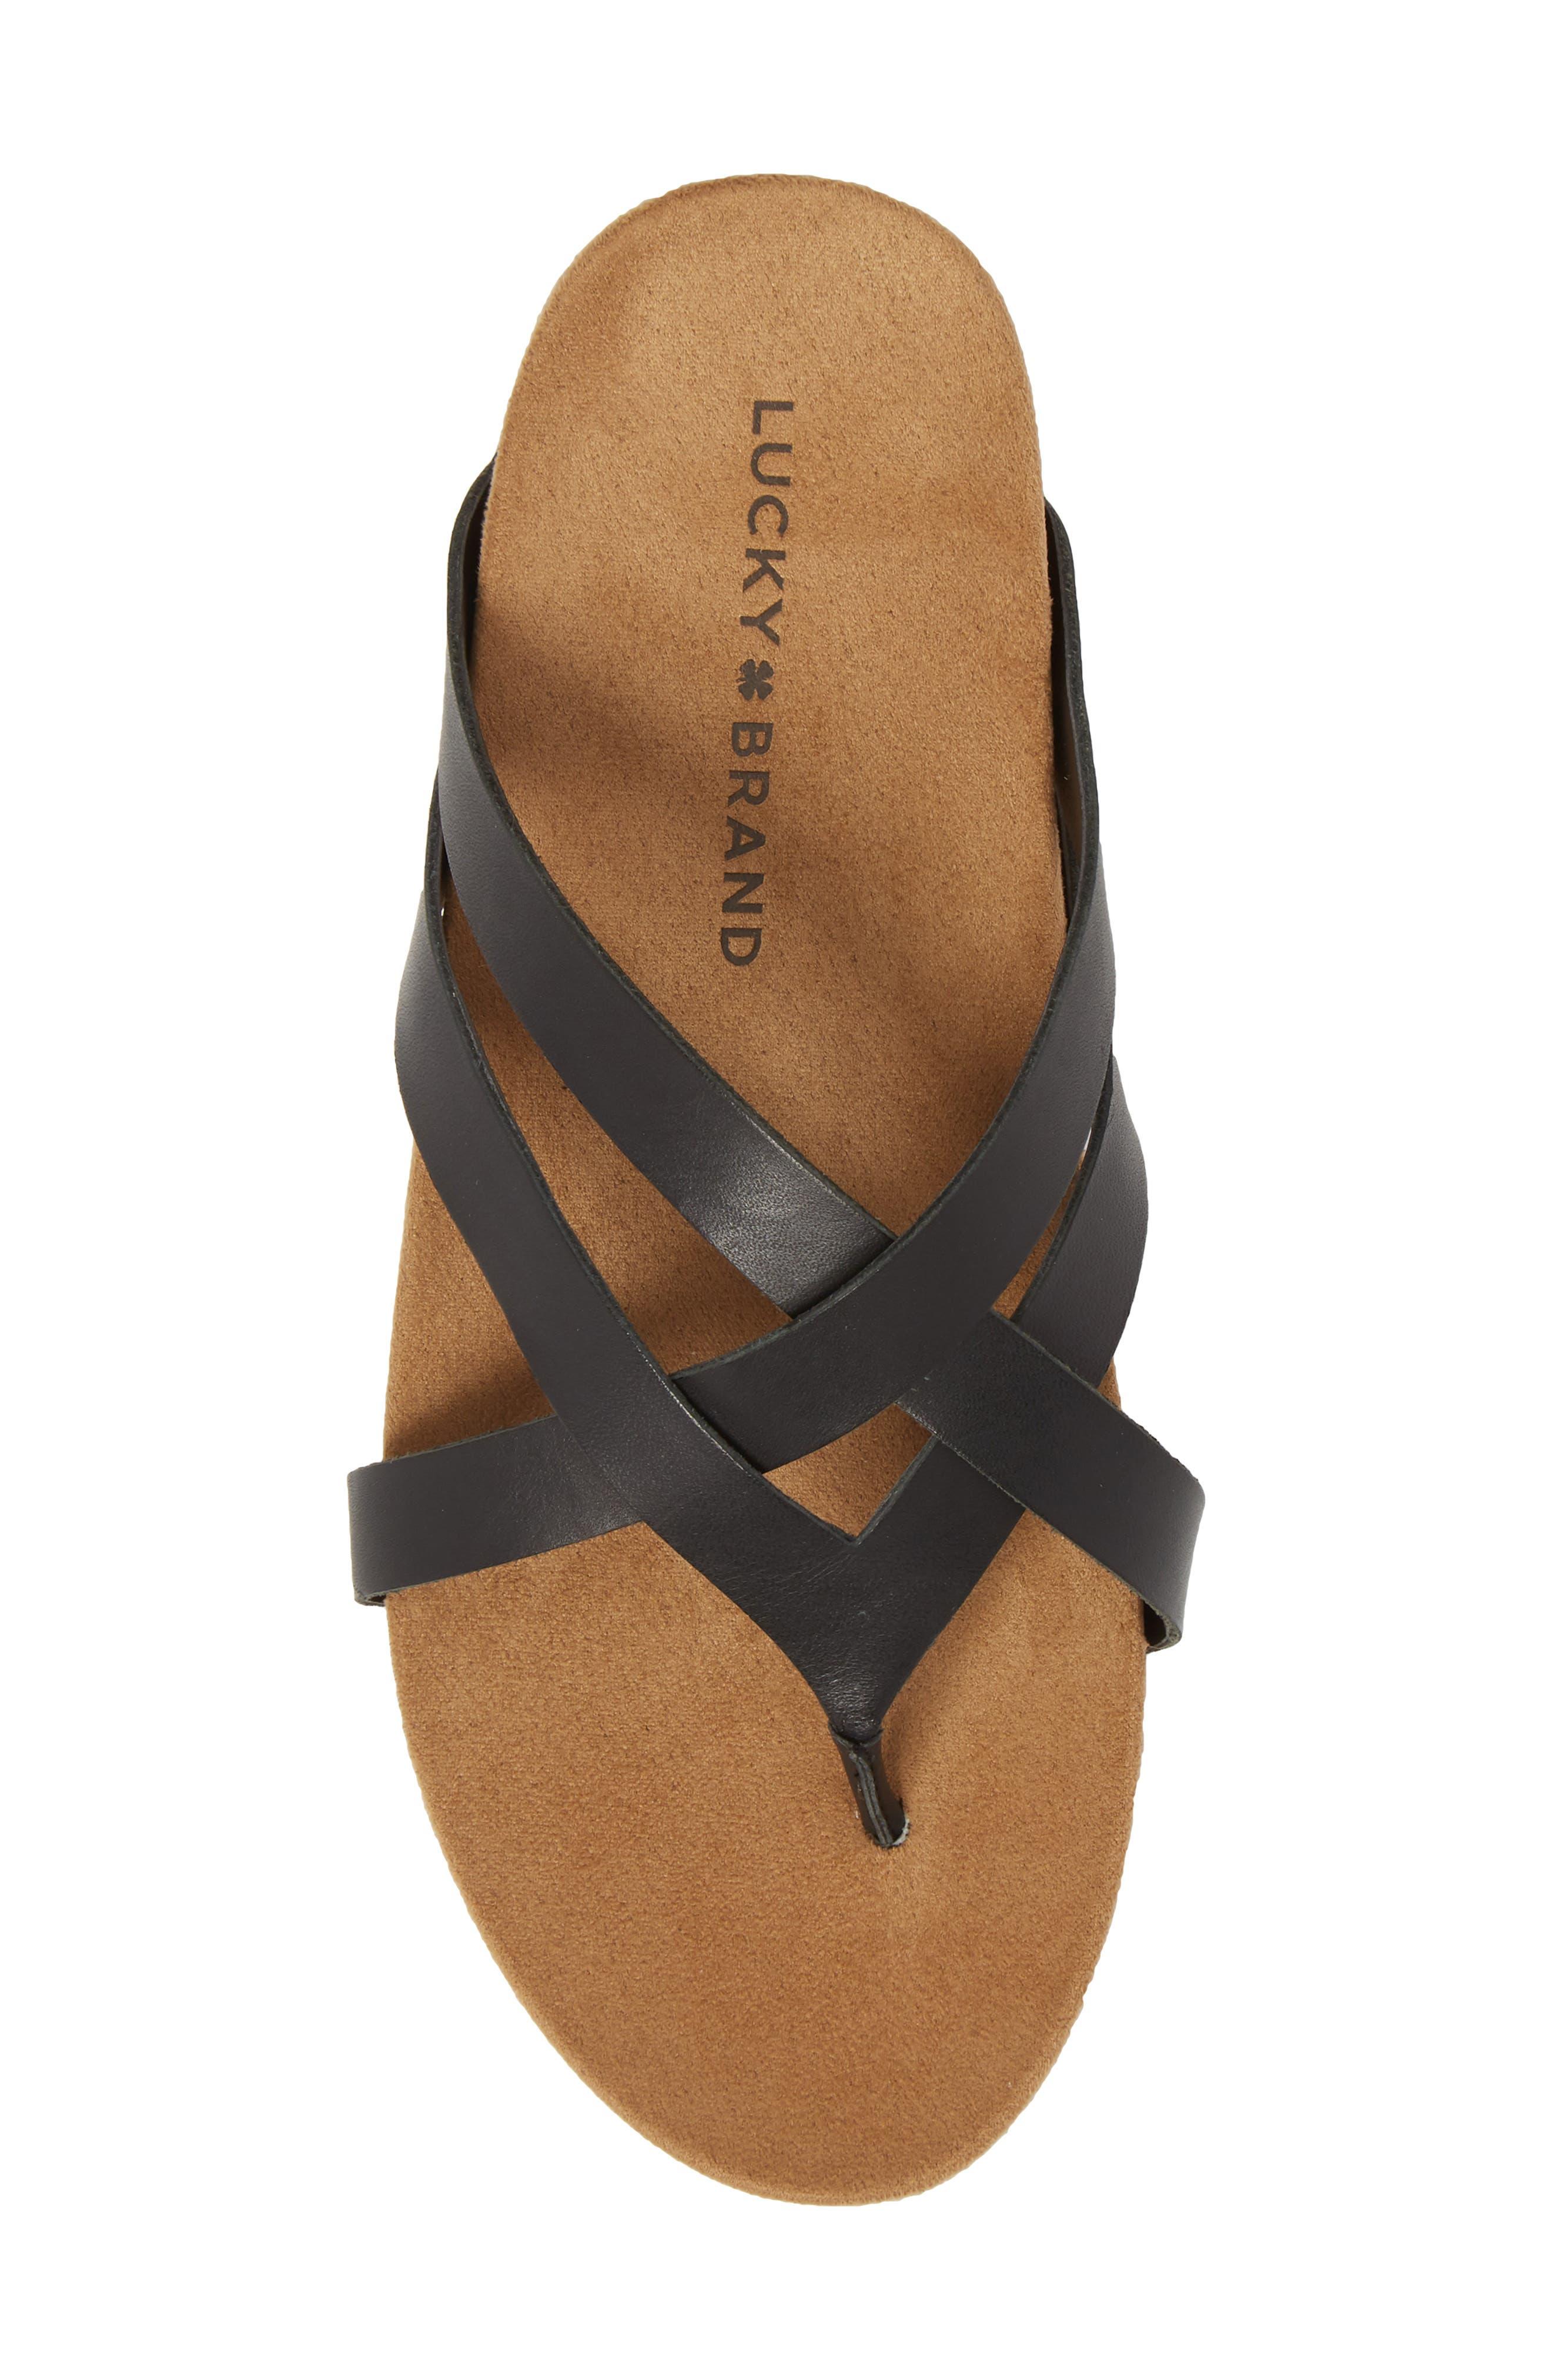 Fillima Flip Flop,                             Alternate thumbnail 5, color,                             Black Leather